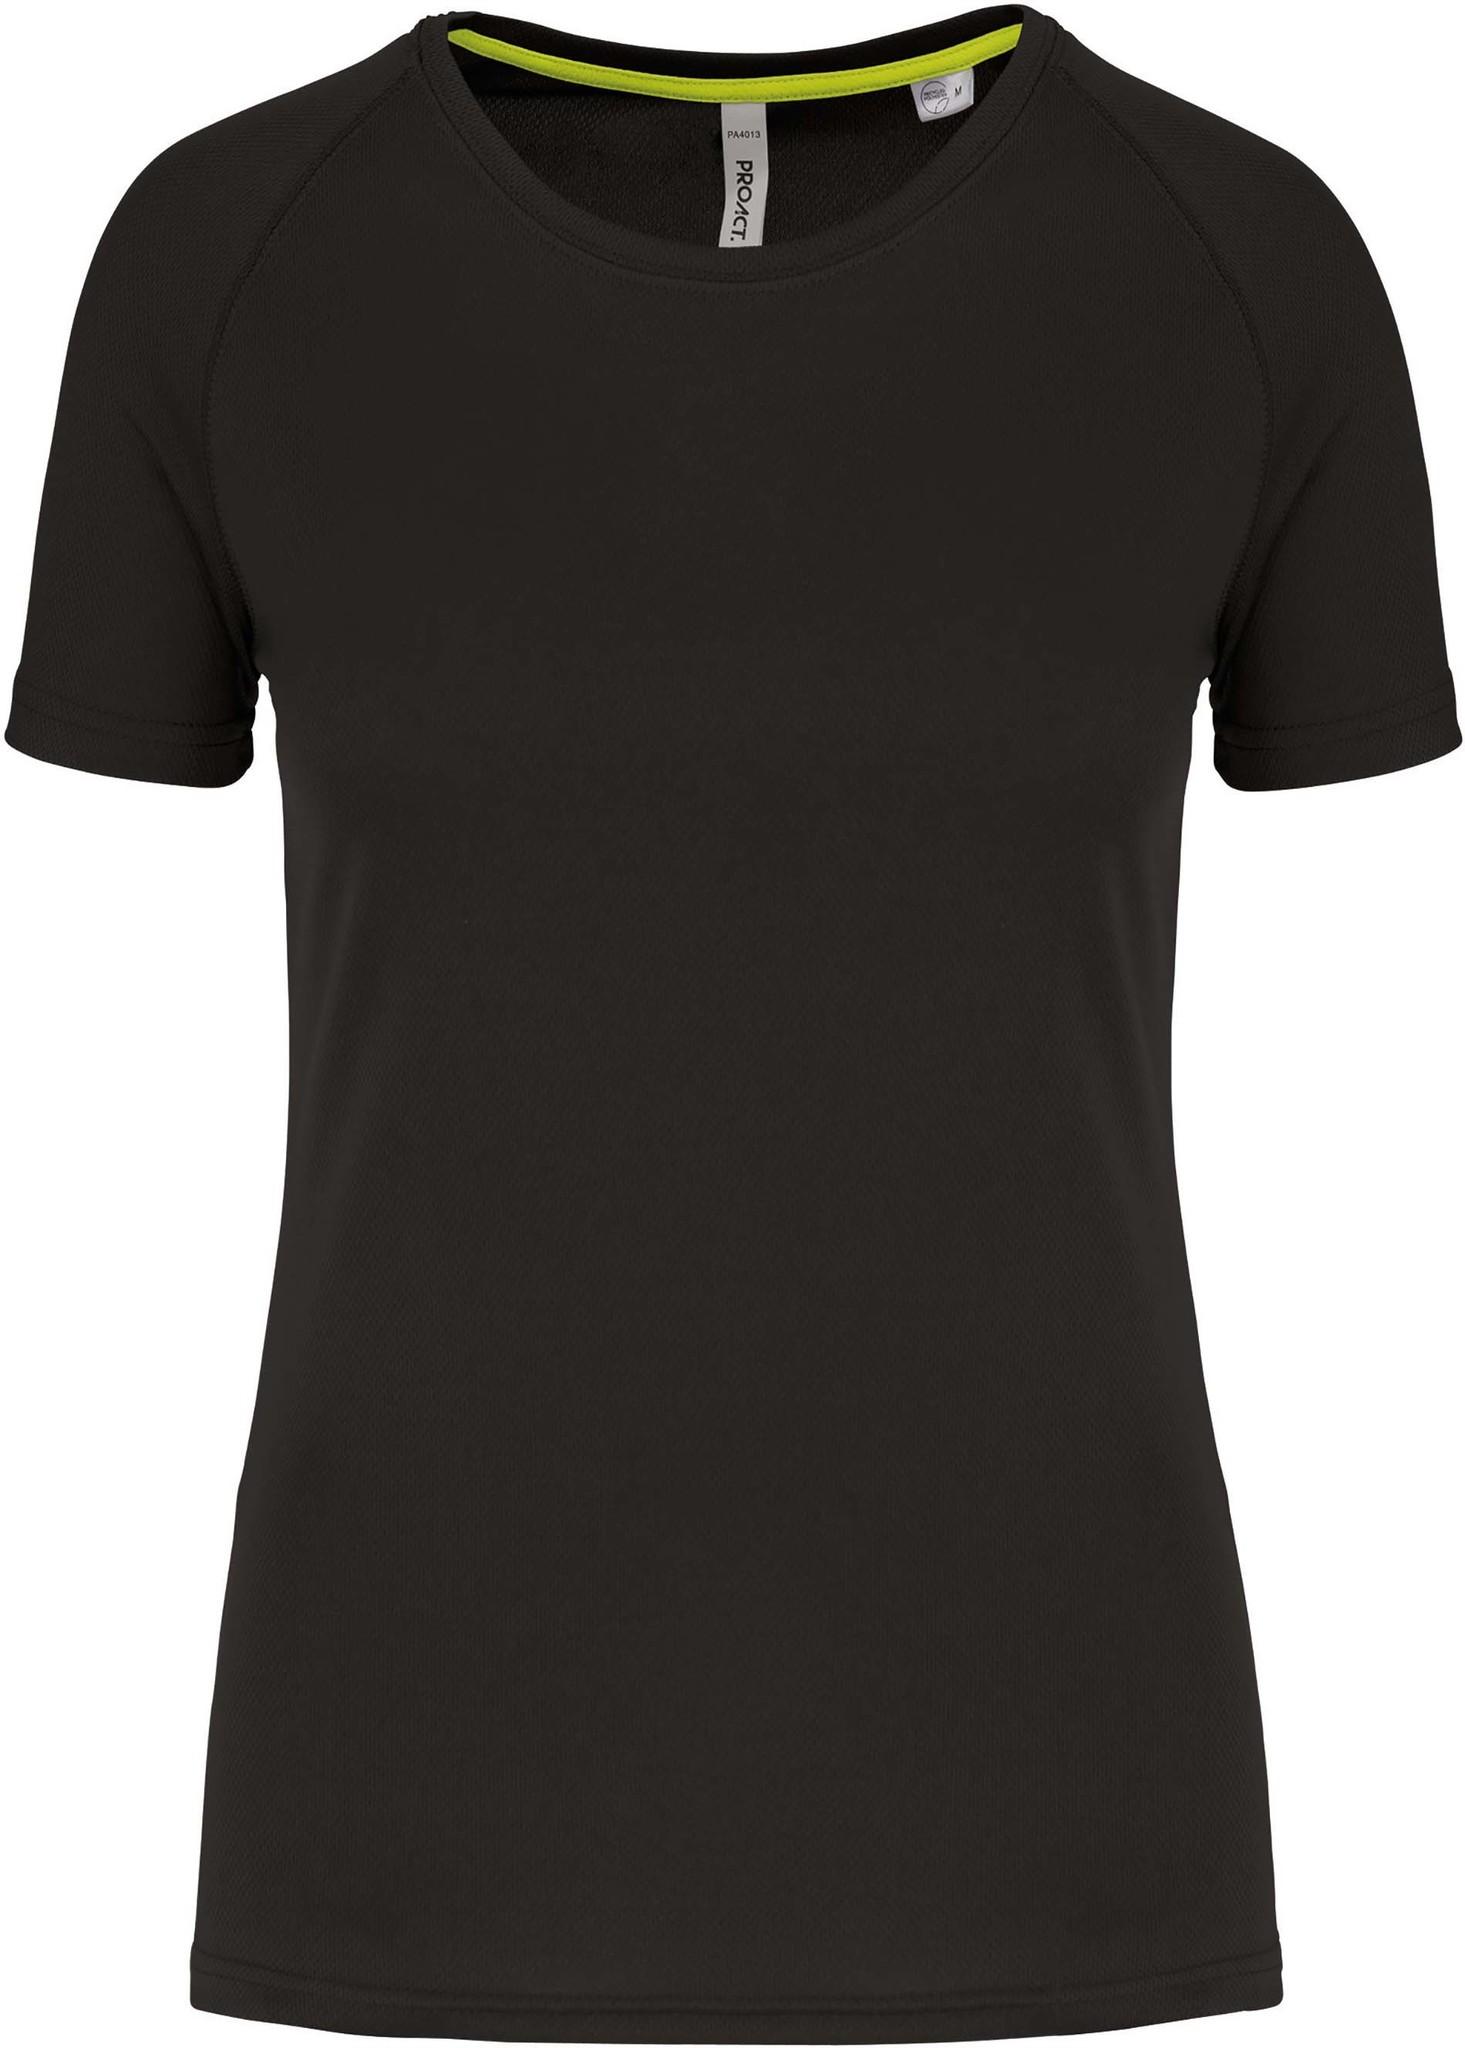 Gerecycled damessport-T-shirt met ronde hals-Zwart